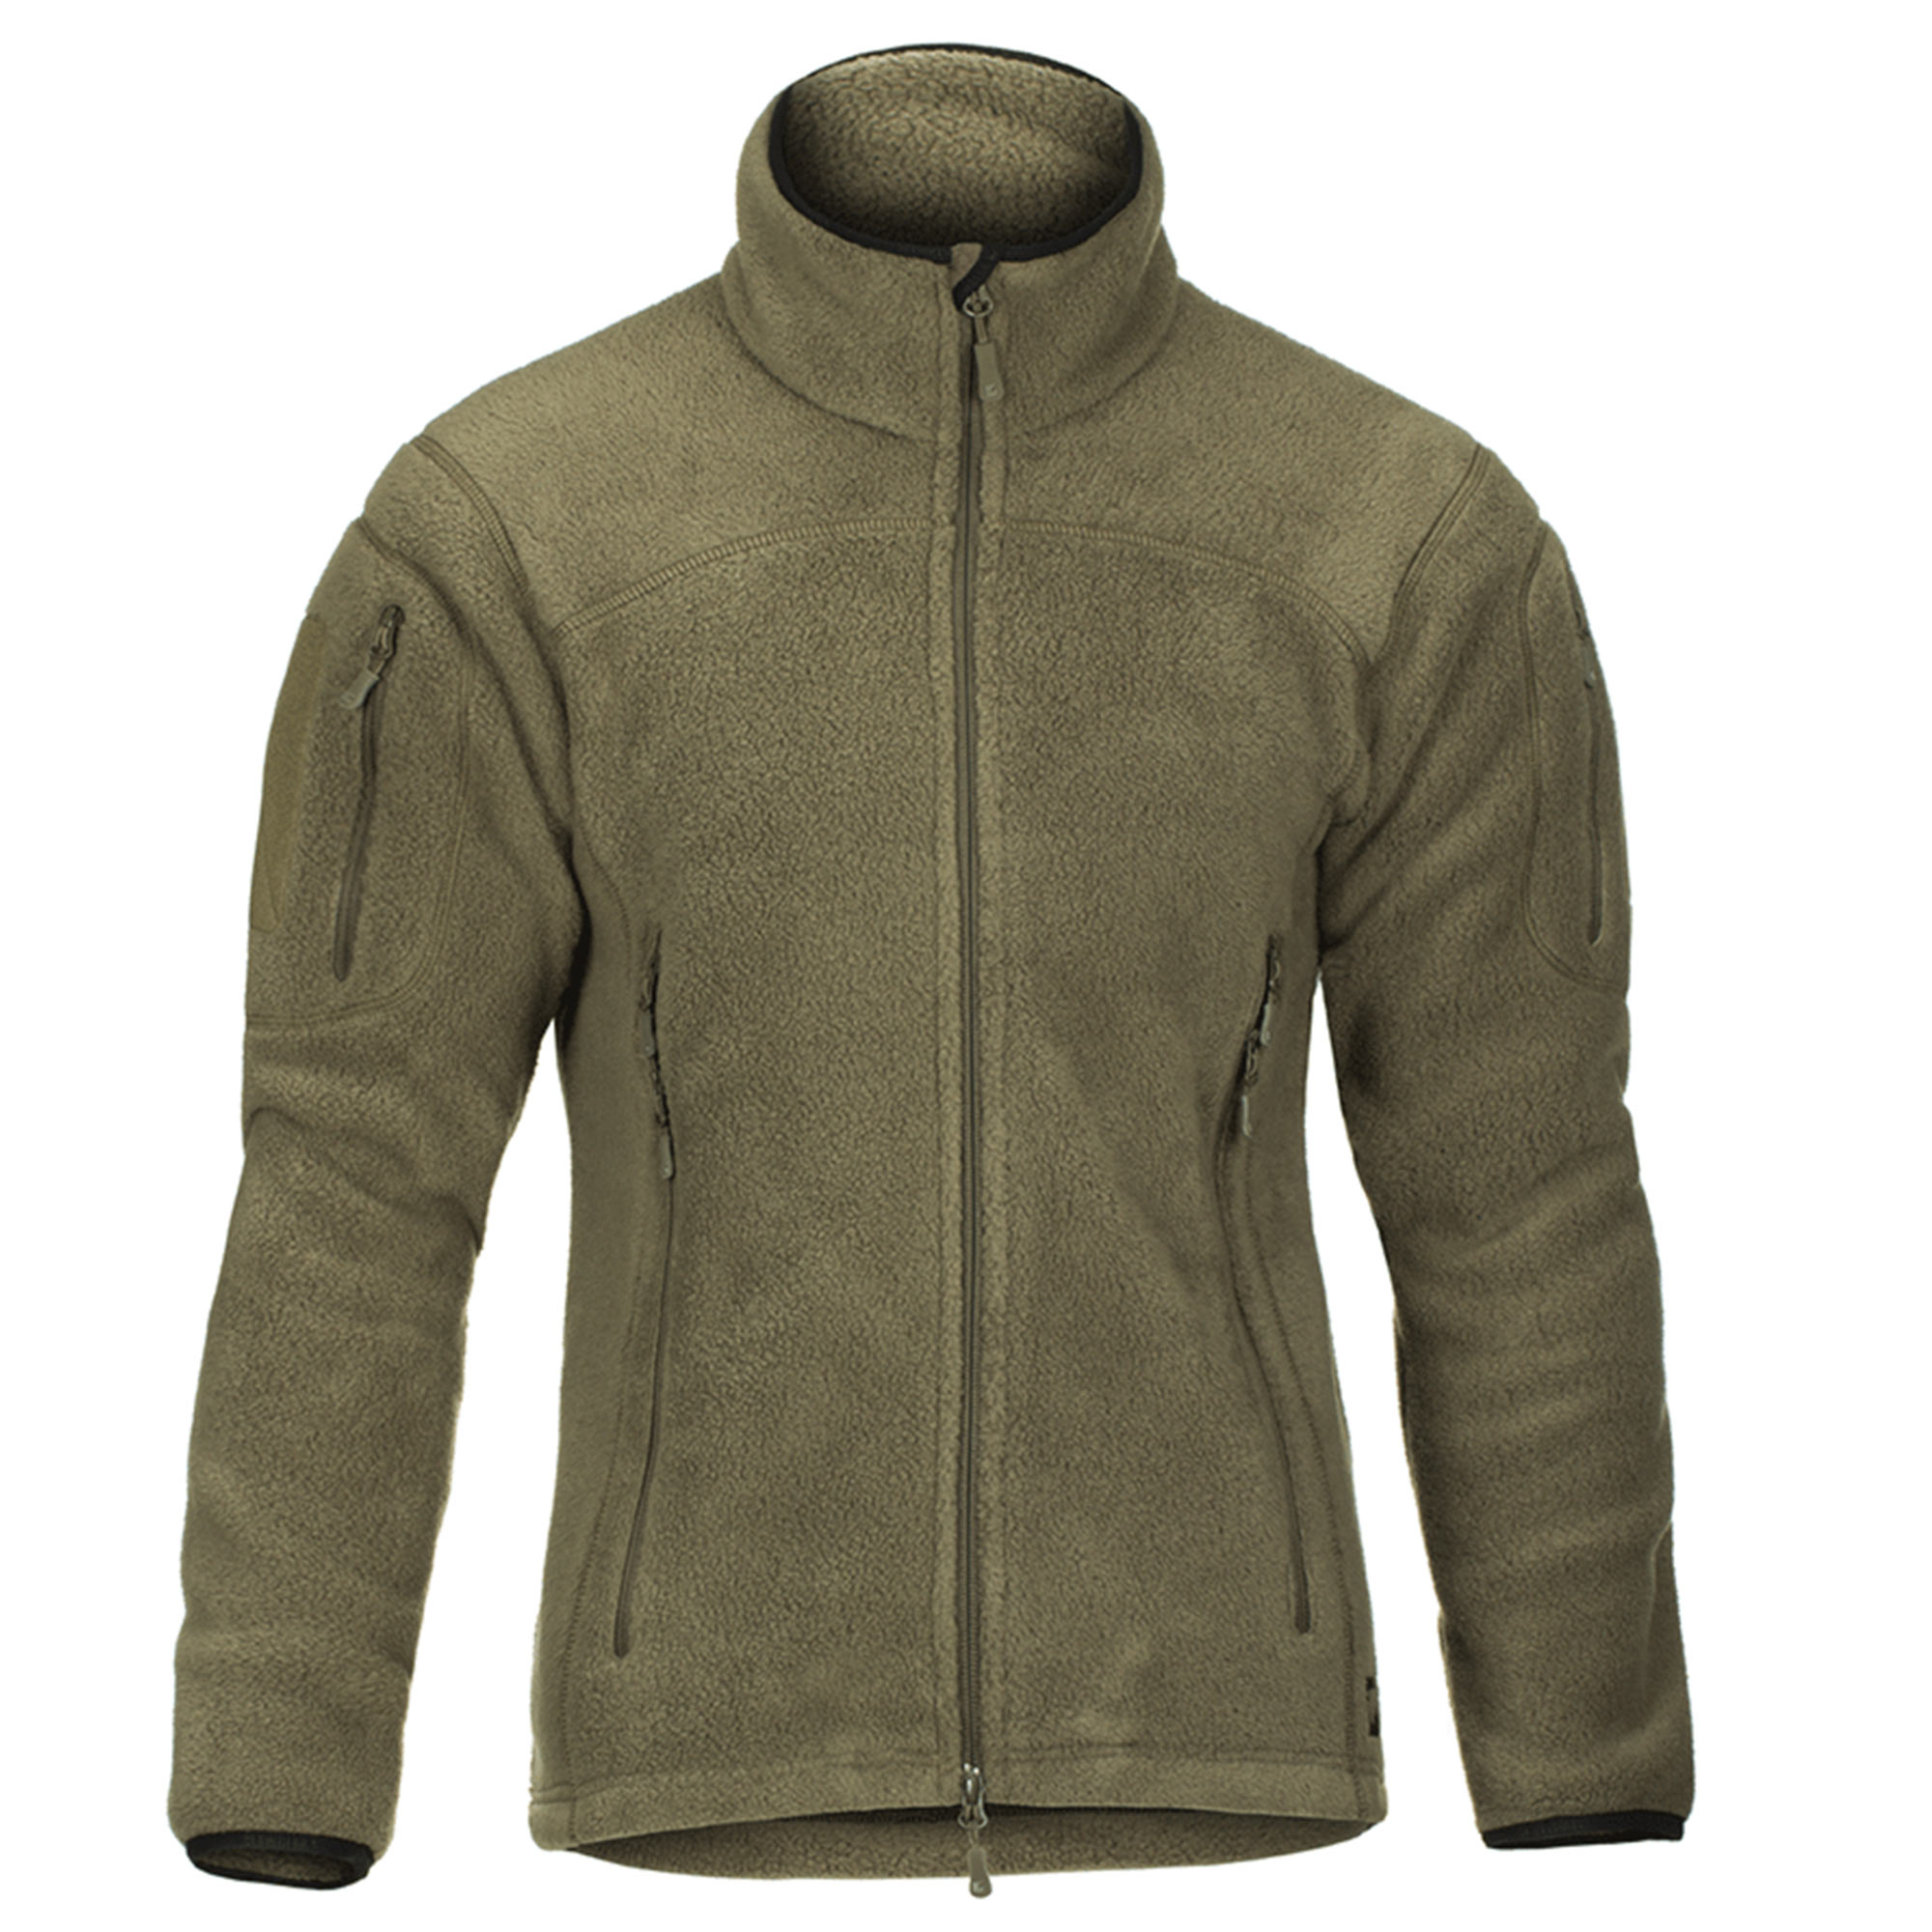 ClawGear Fleece Jacket Milvago stone olive